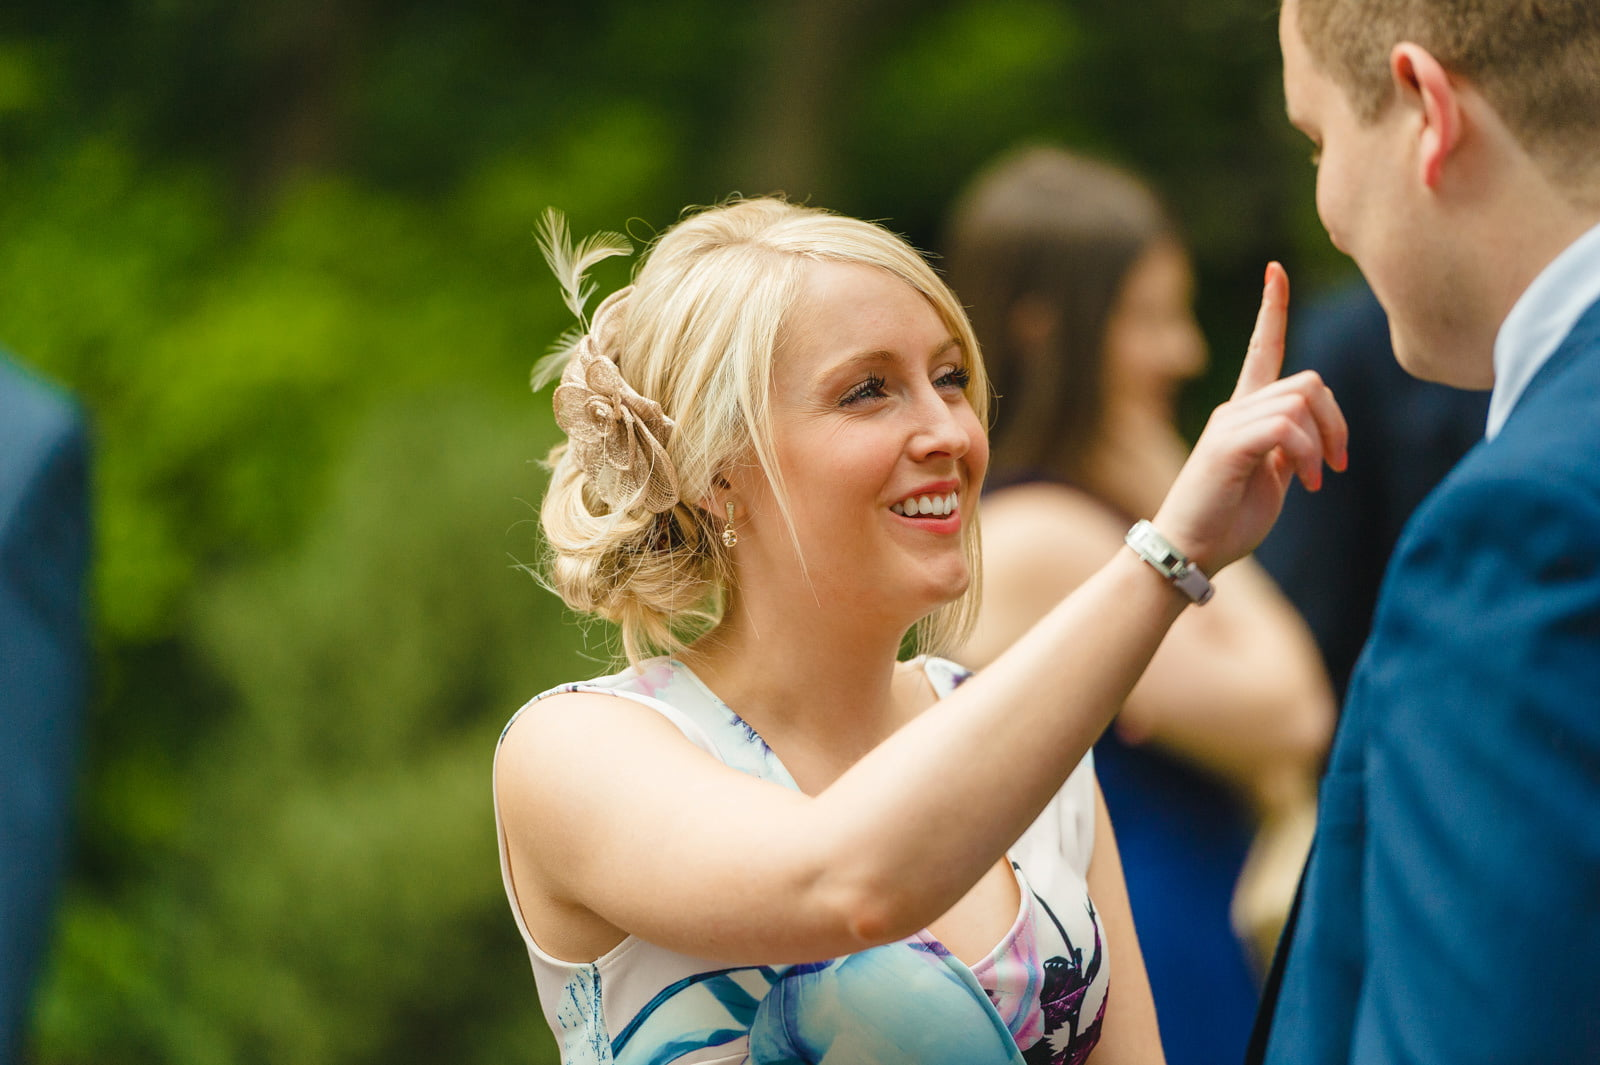 Millers Of Netley wedding, Dorrington, Shrewsbury | Emma + Ben 30